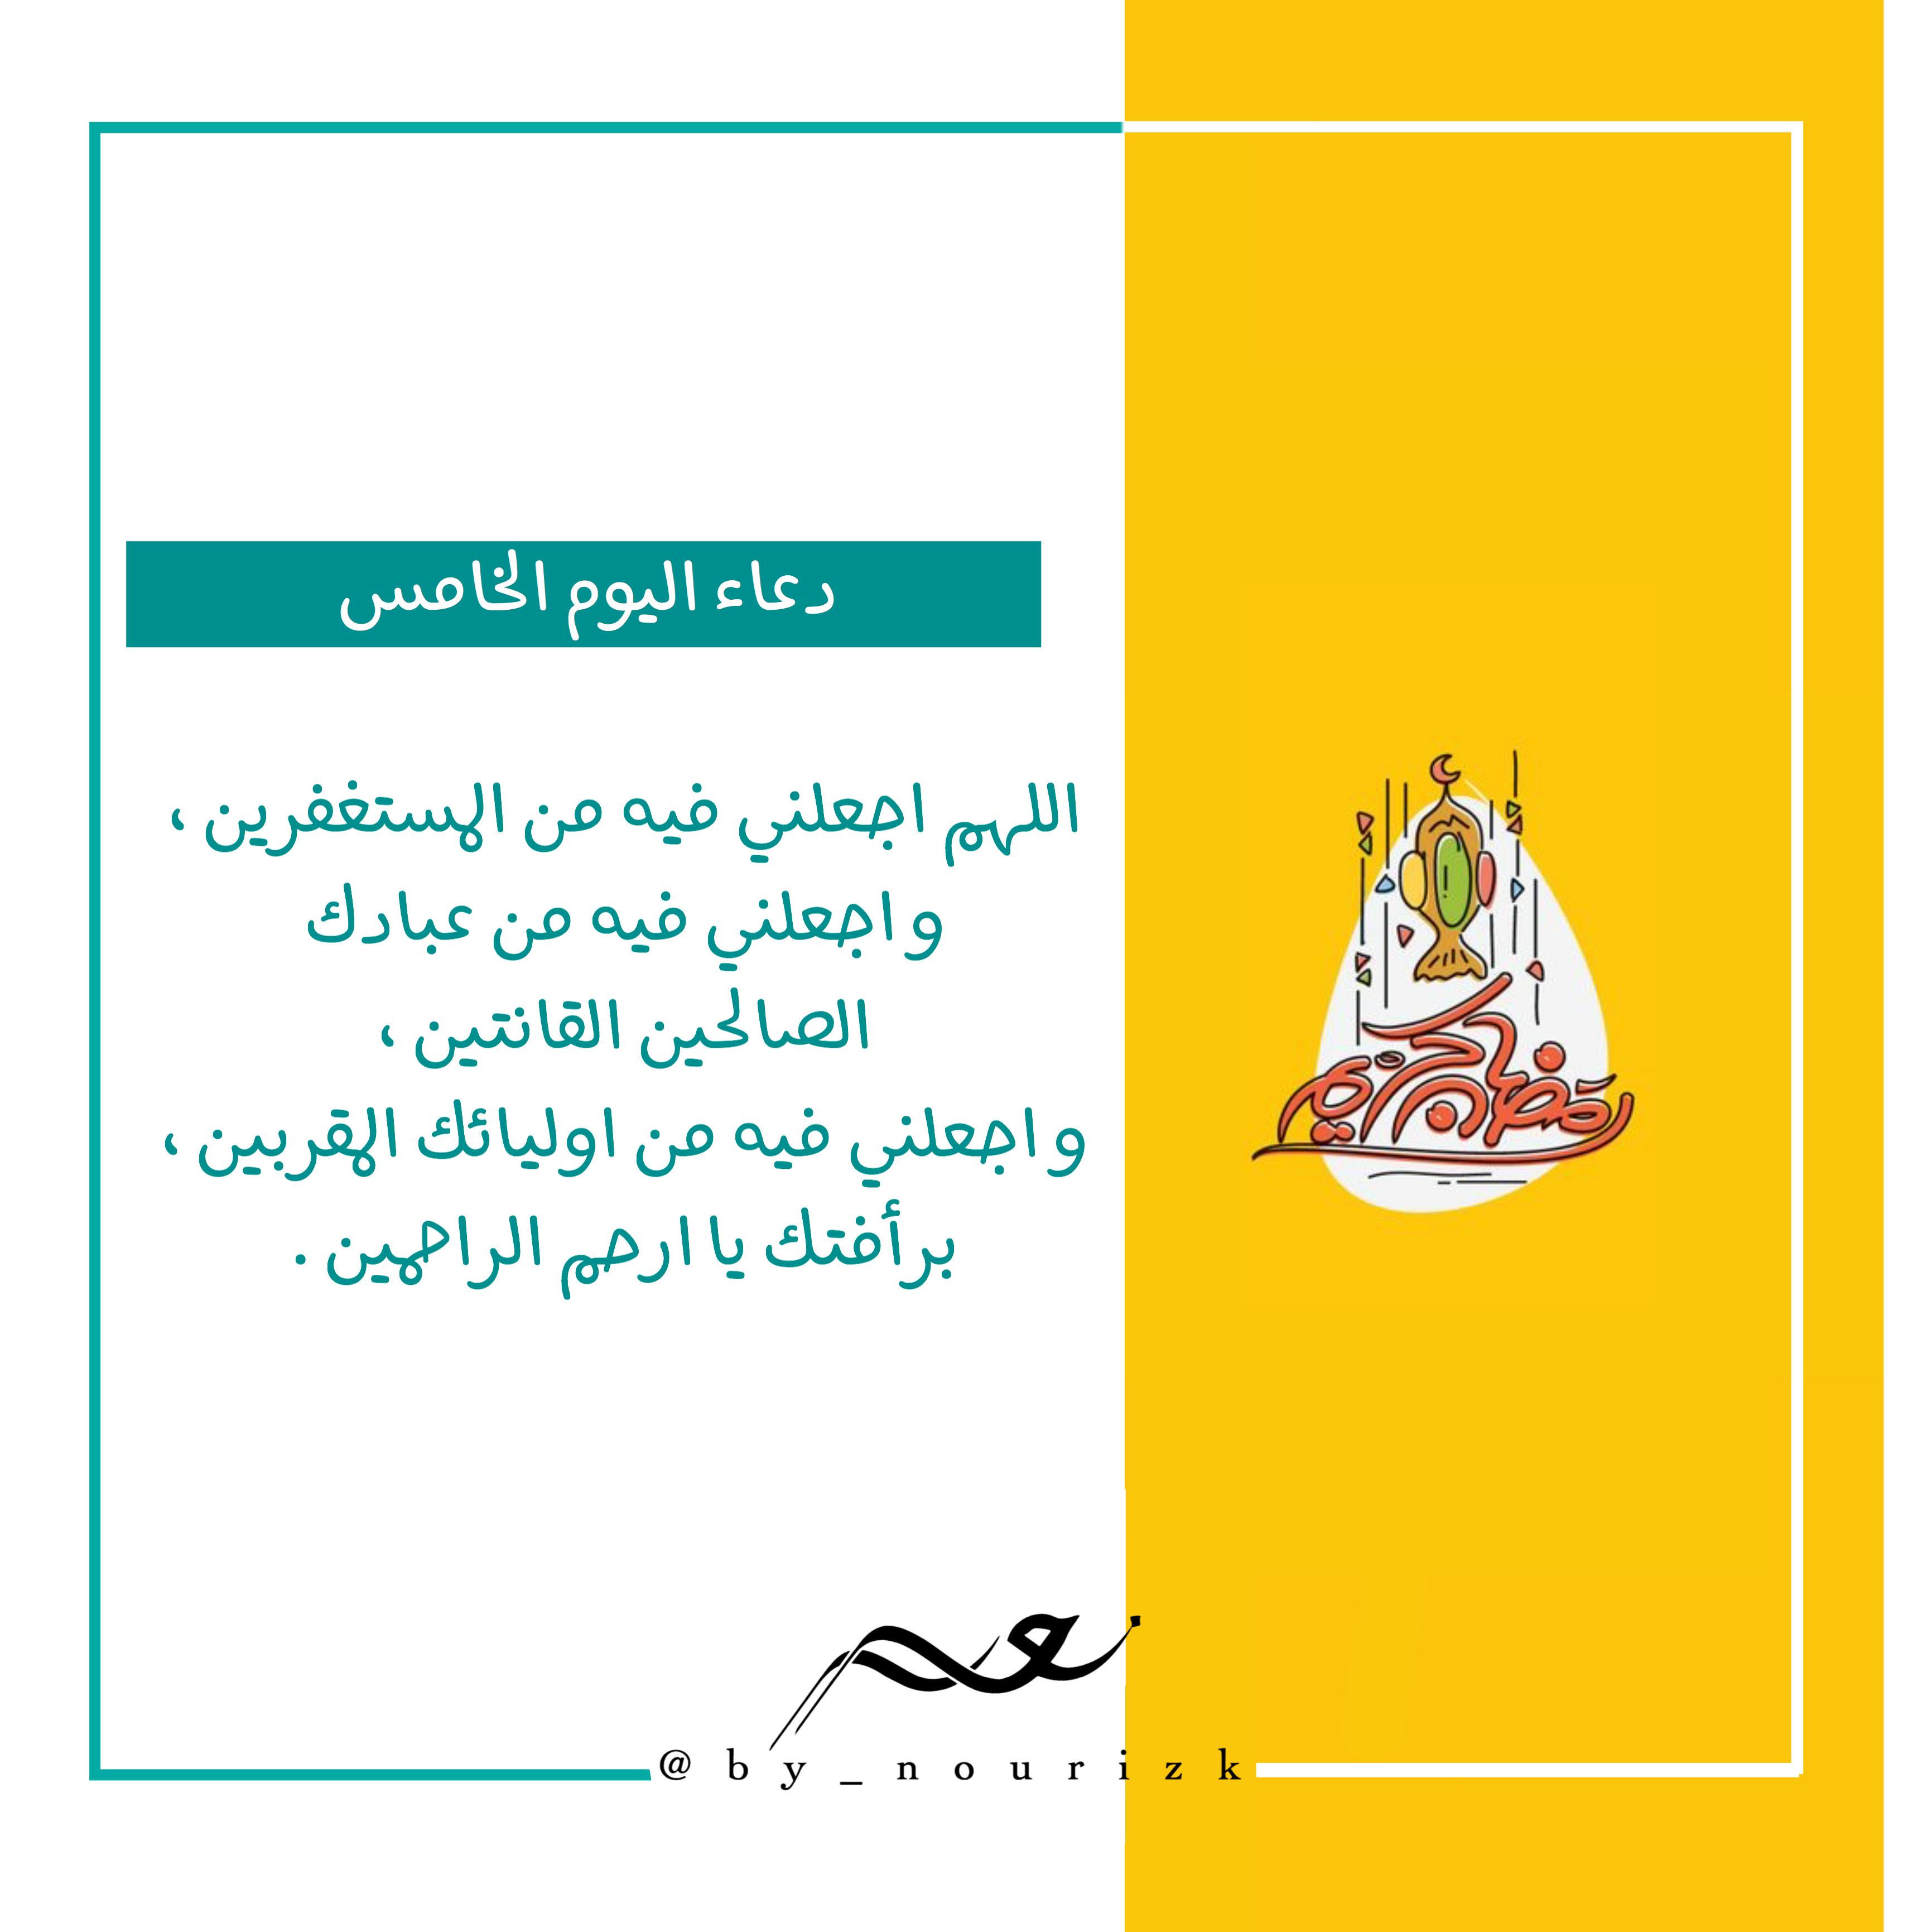 دعاء اليوم الخامس من شهر رمضان Islamic Quotes Quran Islamic Quotes Arabic Love Quotes